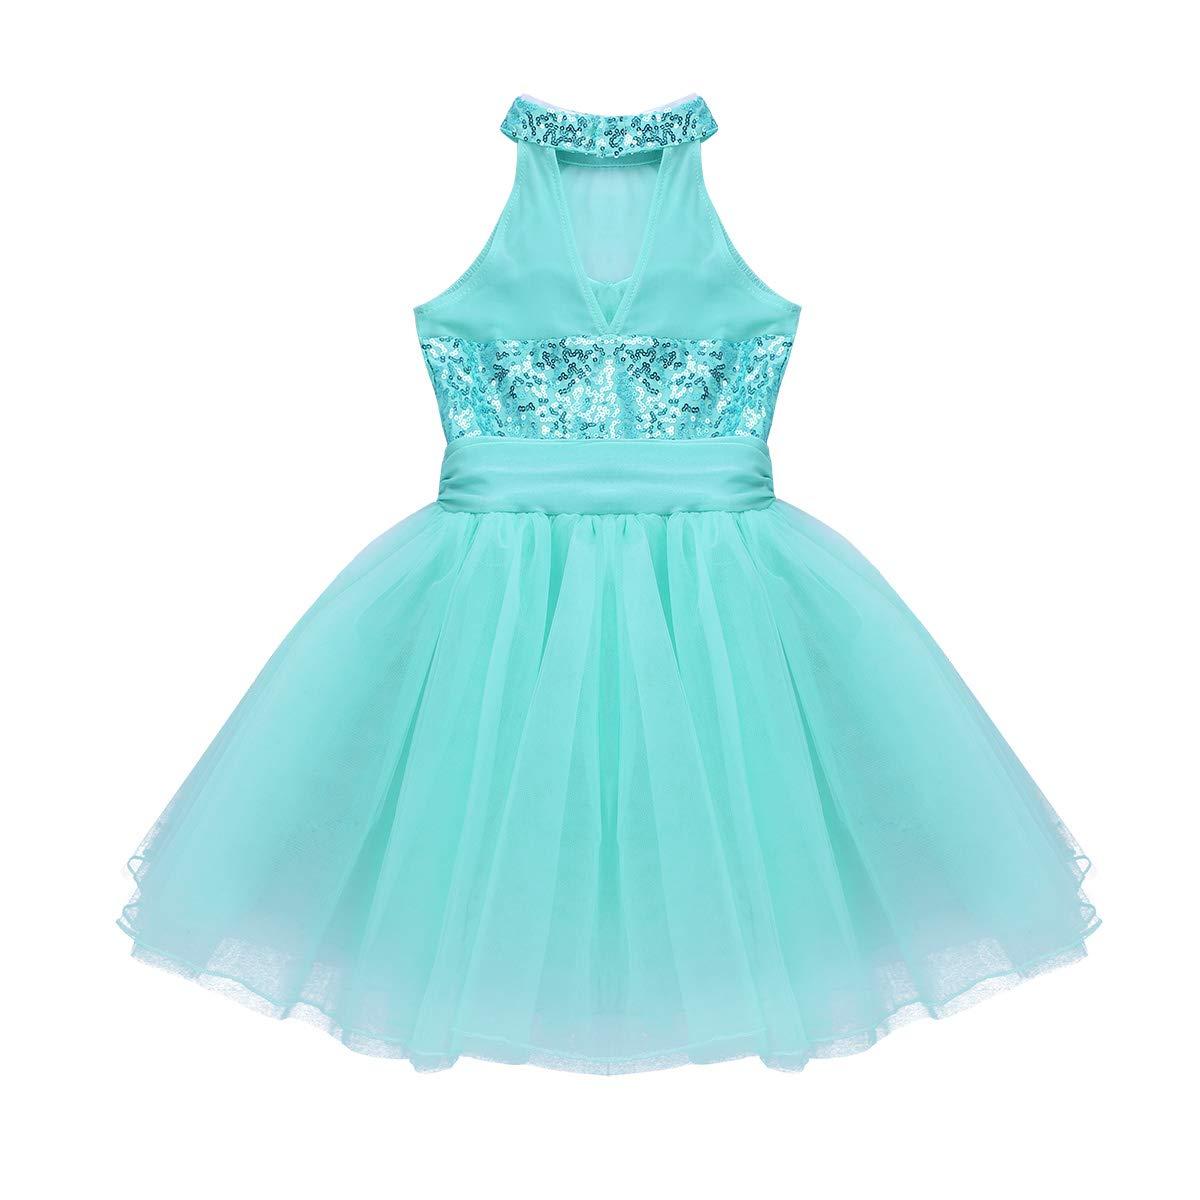 iixpin Kids Girls Ballet Dance Tutu Dress Sleeveless Mesh Splice Sequins Halter Leotard Active Gymnastic Camisole